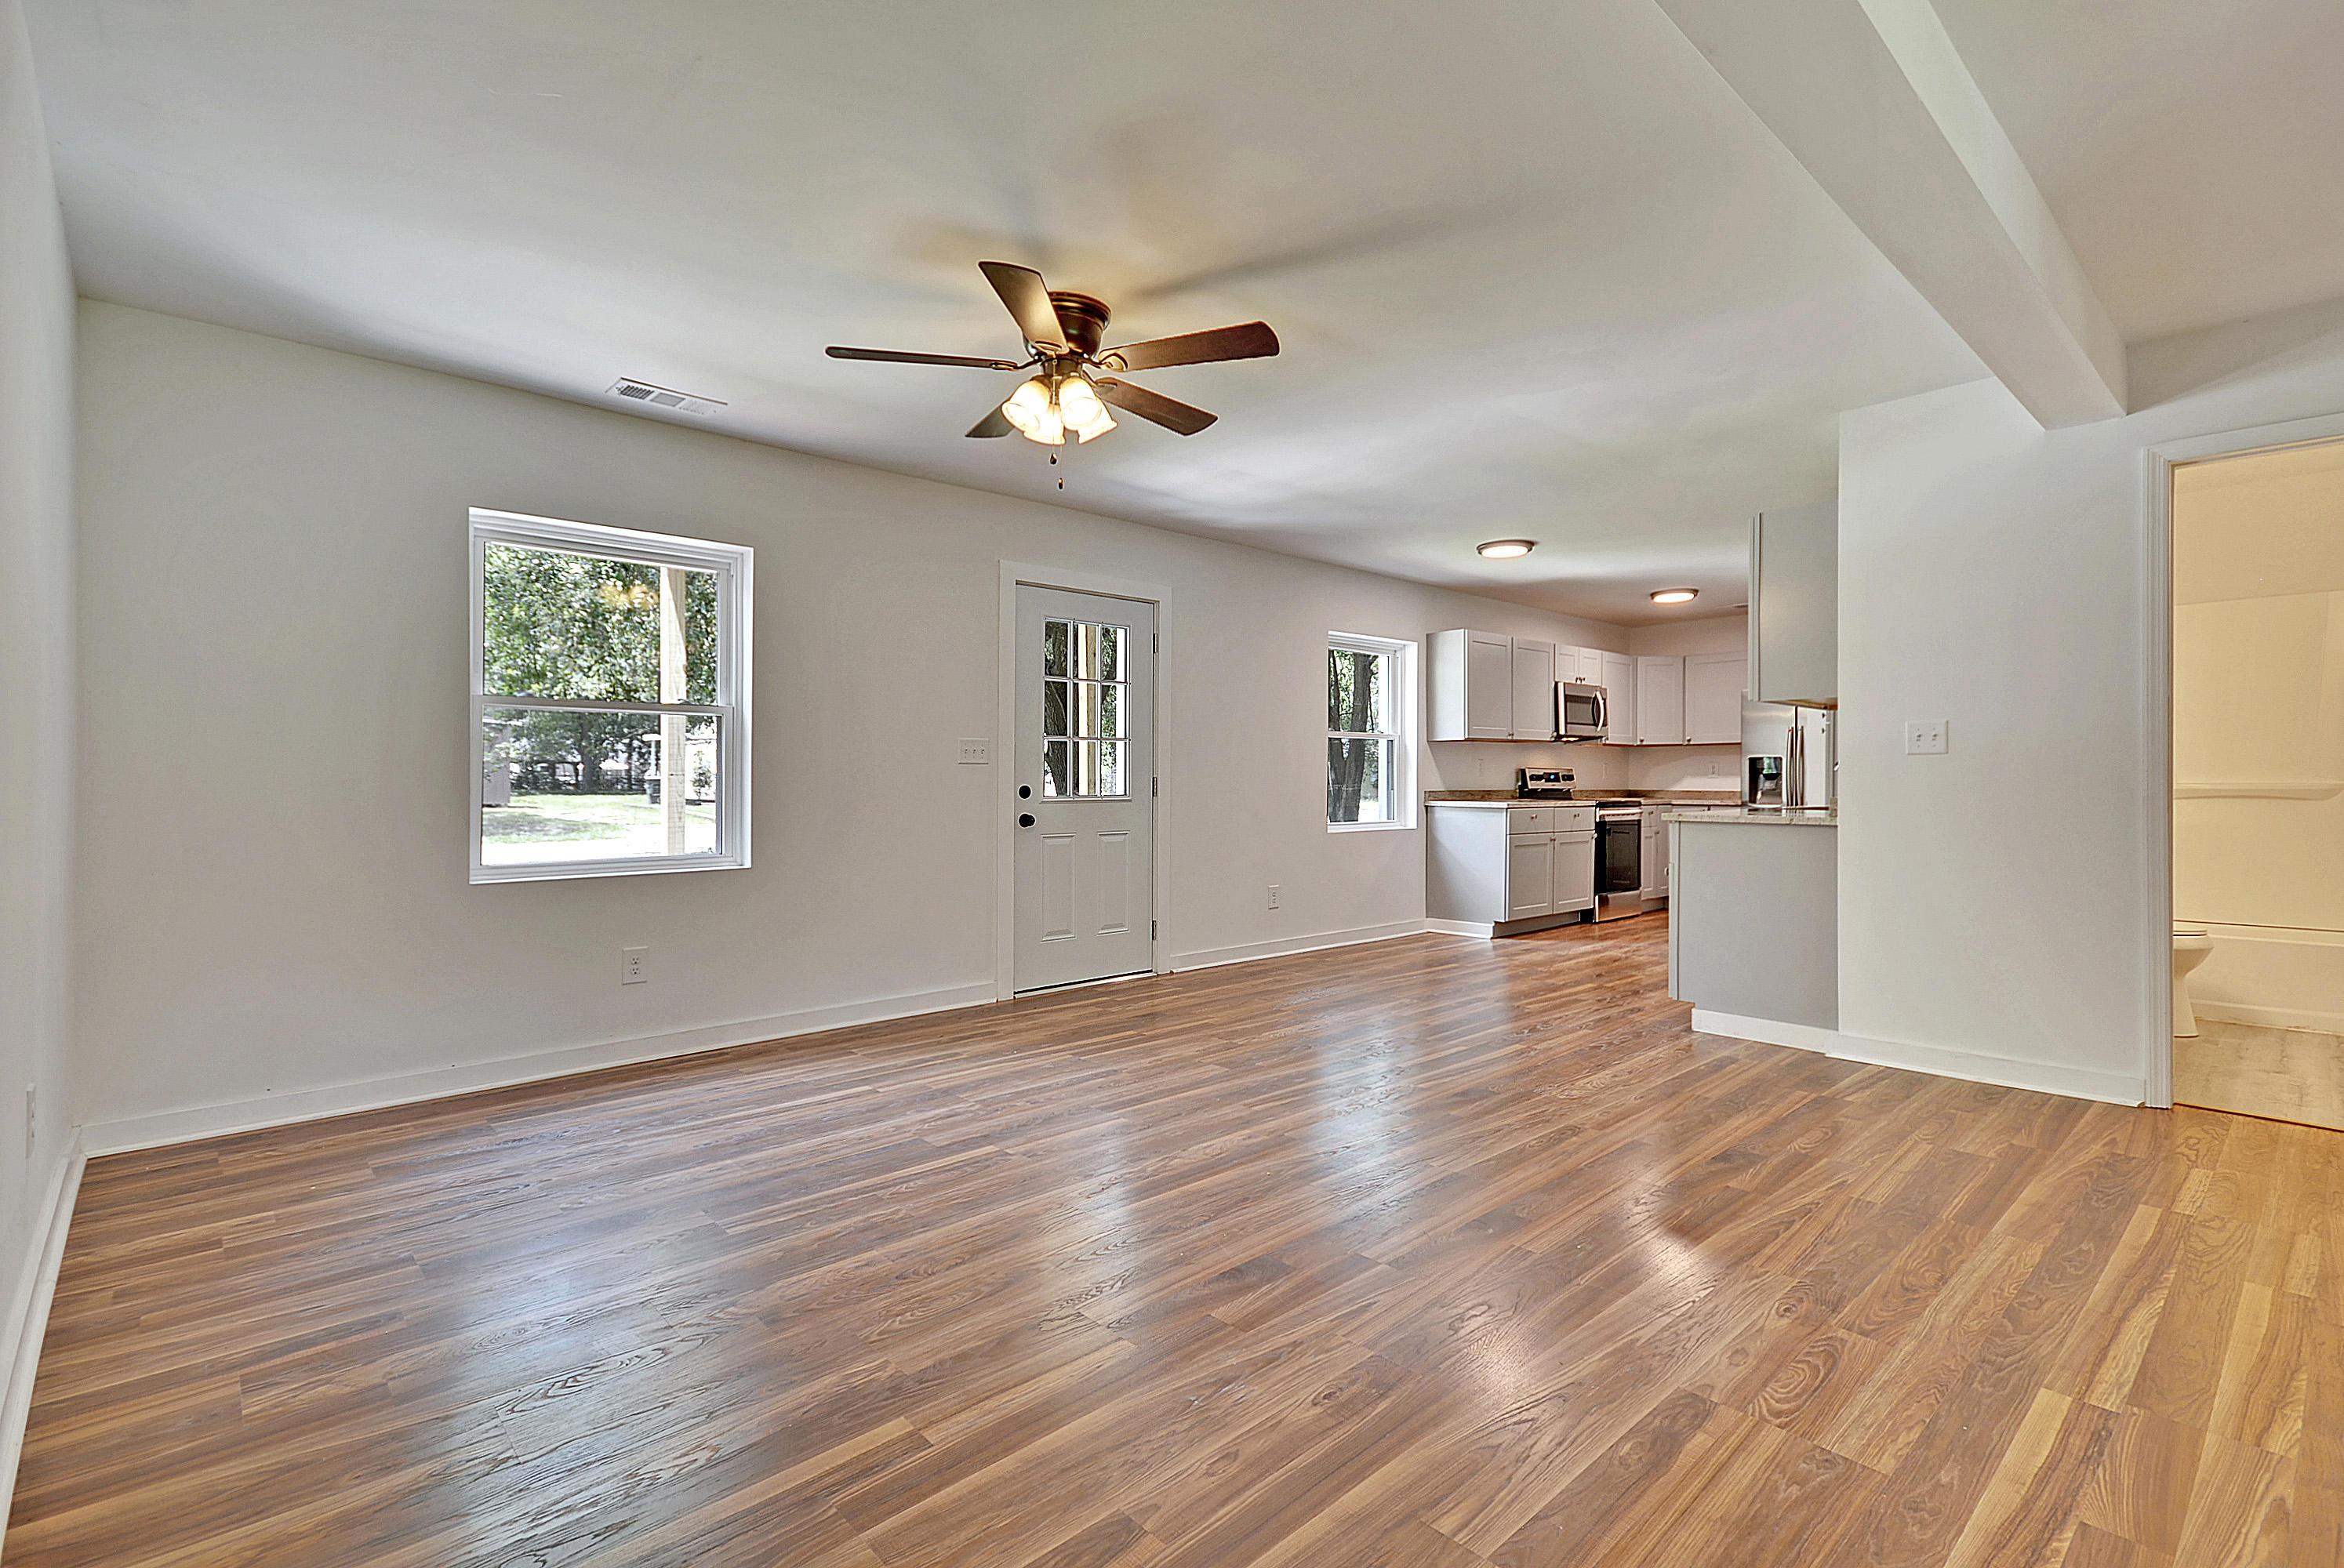 Yeamans Park Homes For Sale - 1207 Jones, Hanahan, SC - 1